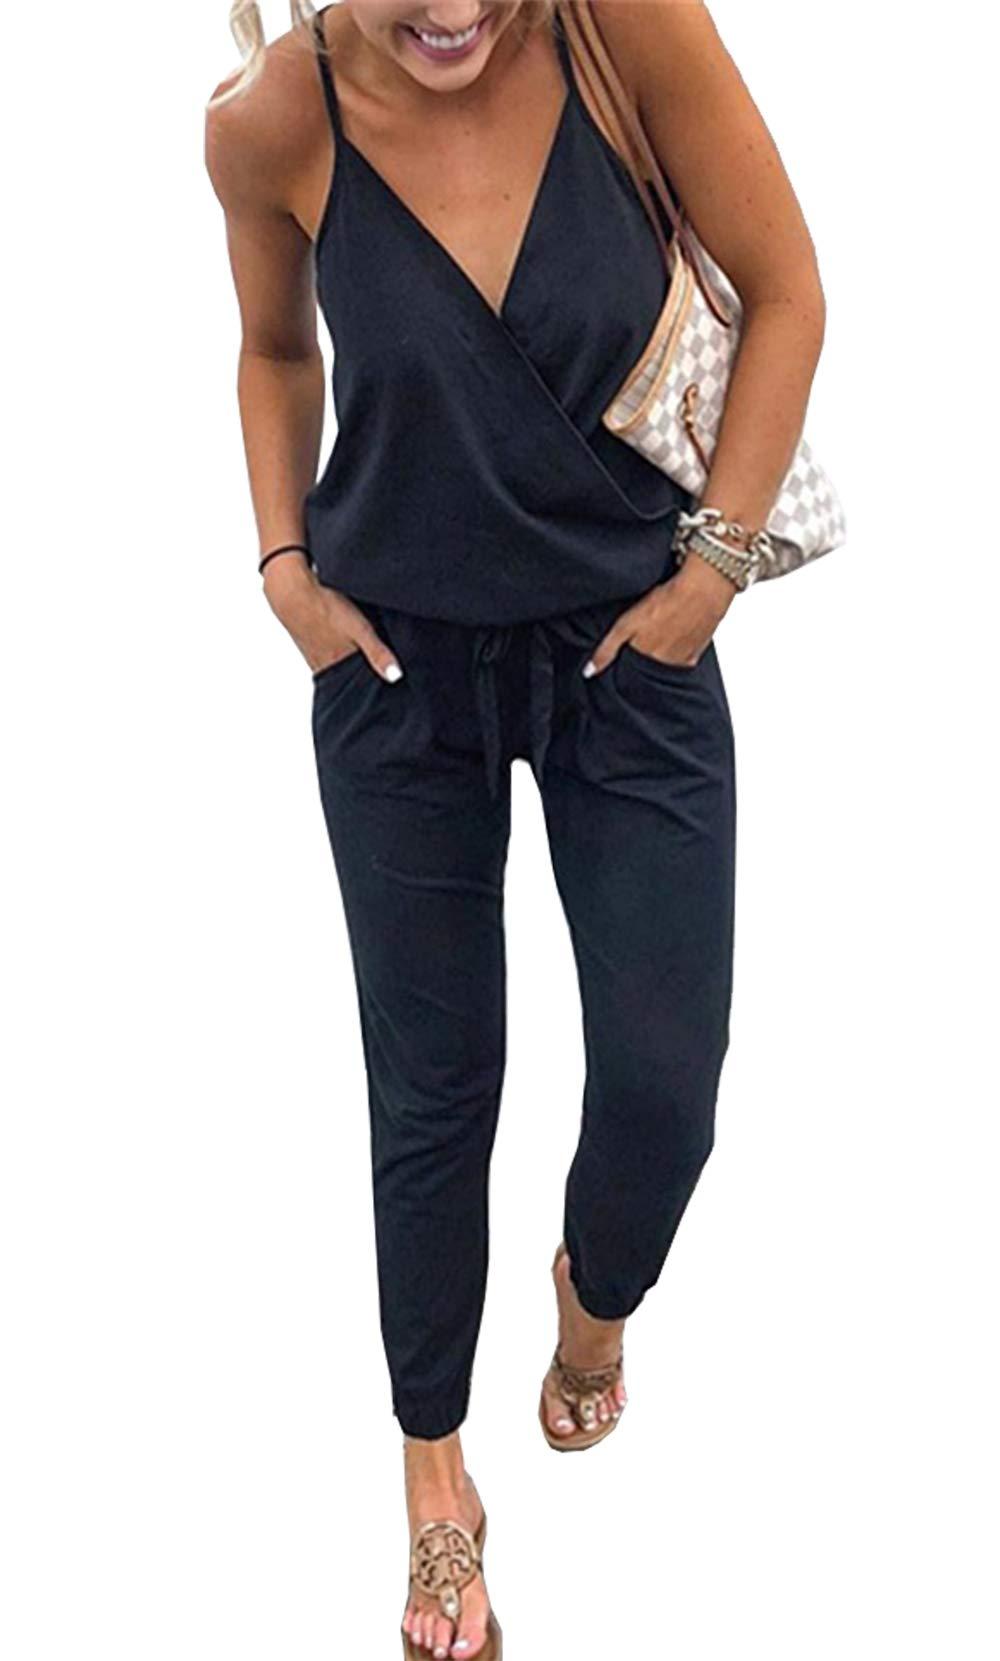 PRETTYGARDEN Women's Sexy Deep V Neck Spaghetti Strap Drawstring Waist Jumpsuit Romper with Pockets by PRETTYGARDEN